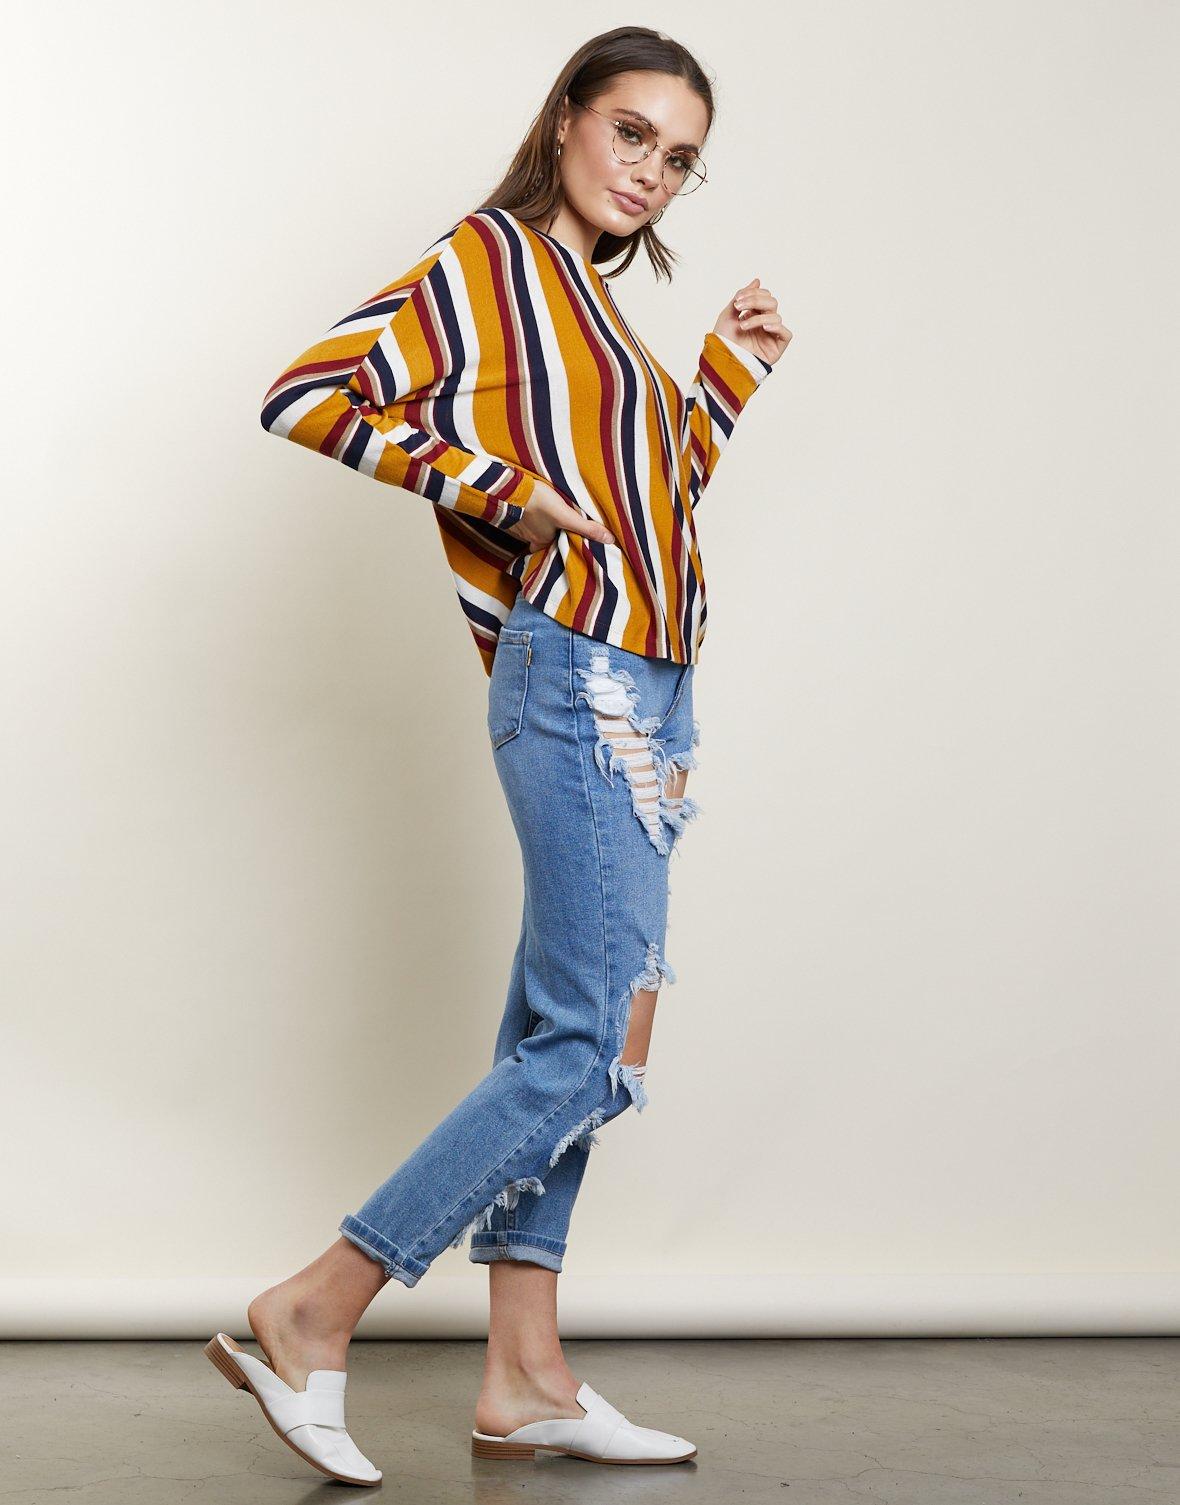 Vertically Striped Shirts